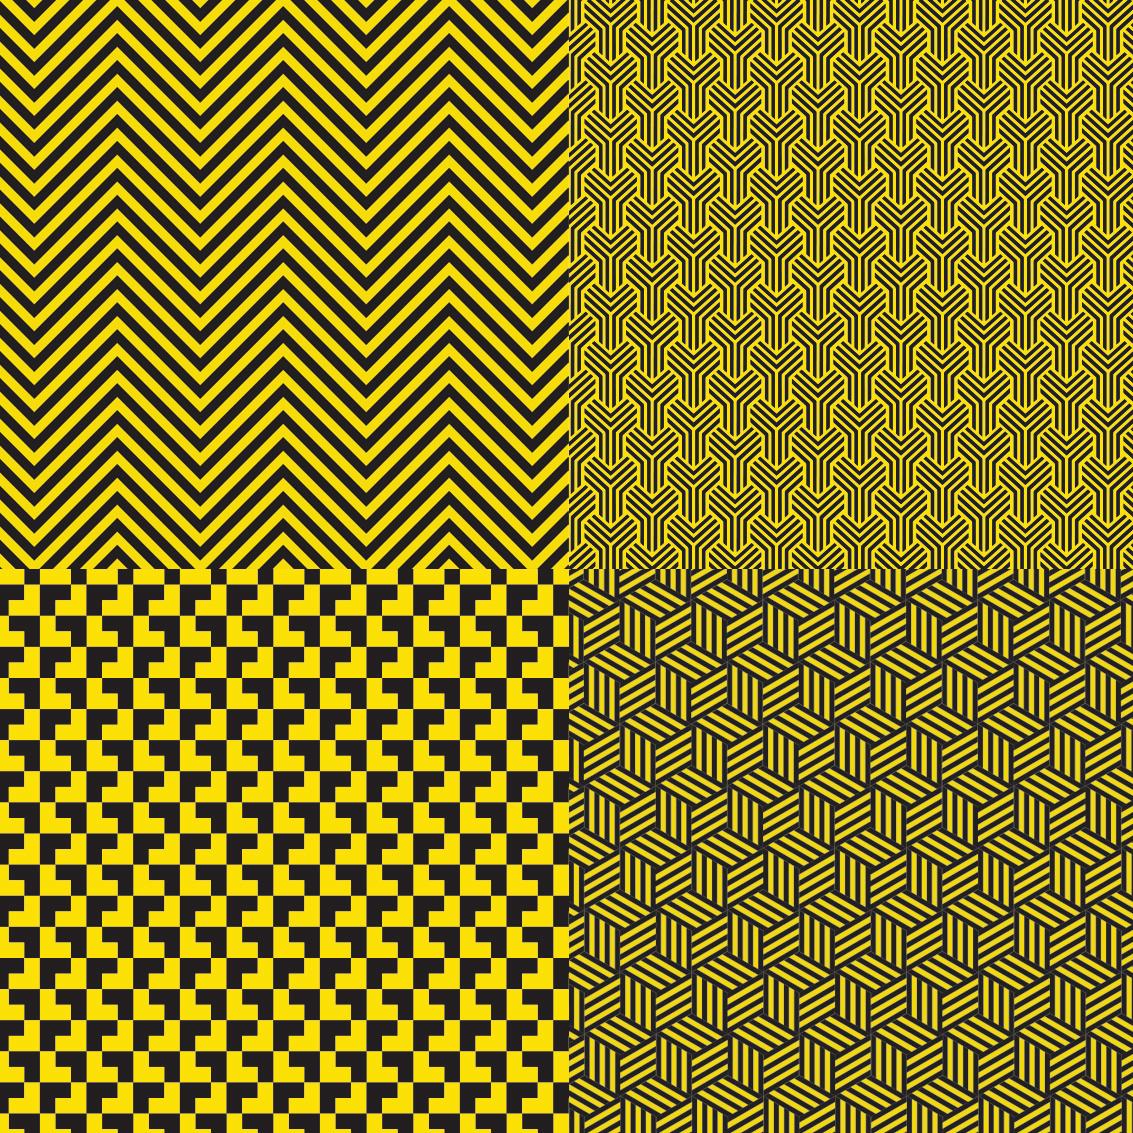 ali_patterns